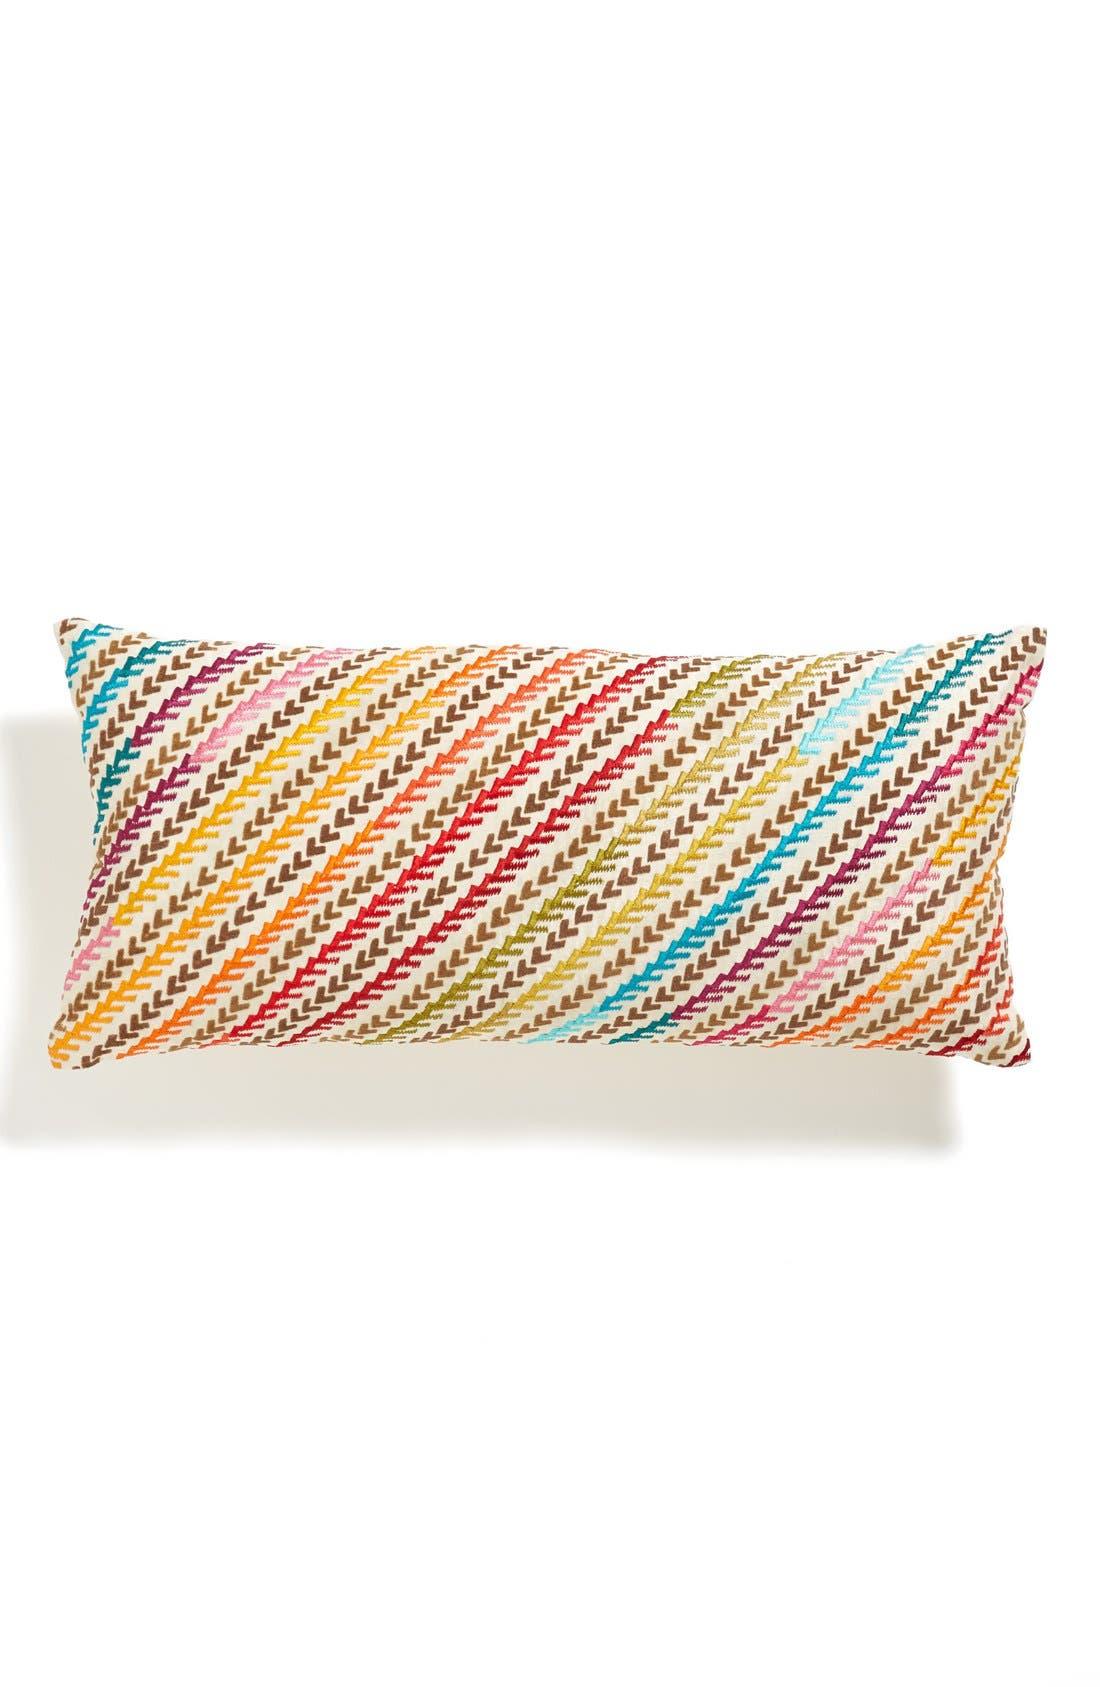 Main Image - Mina Victory 'Slanted Arrows' Pillow